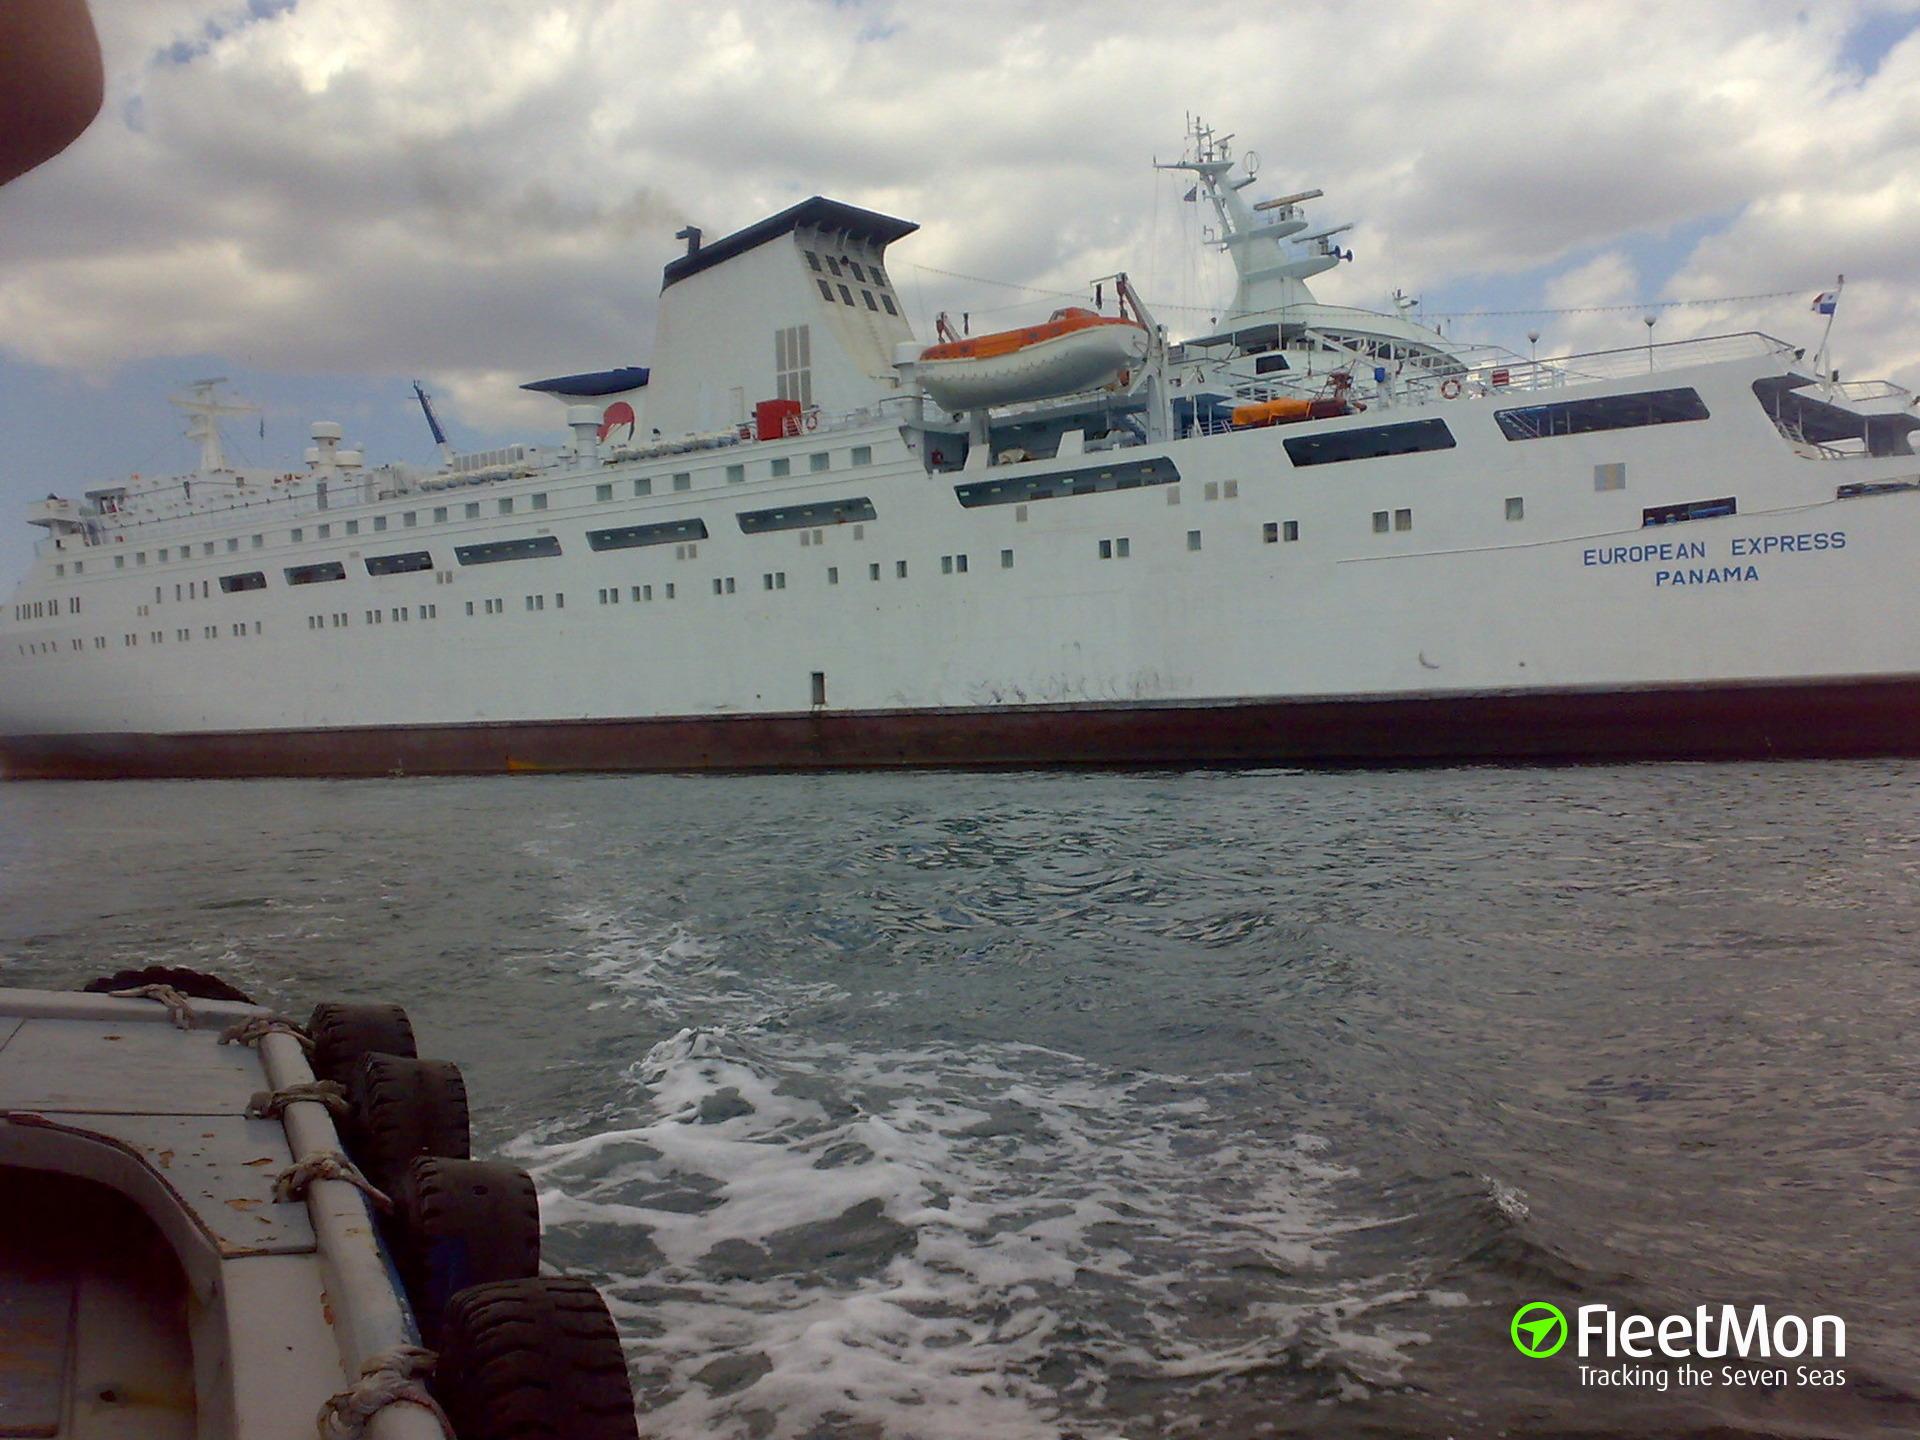   Passenger ships collided at Perama, Piraeus - again